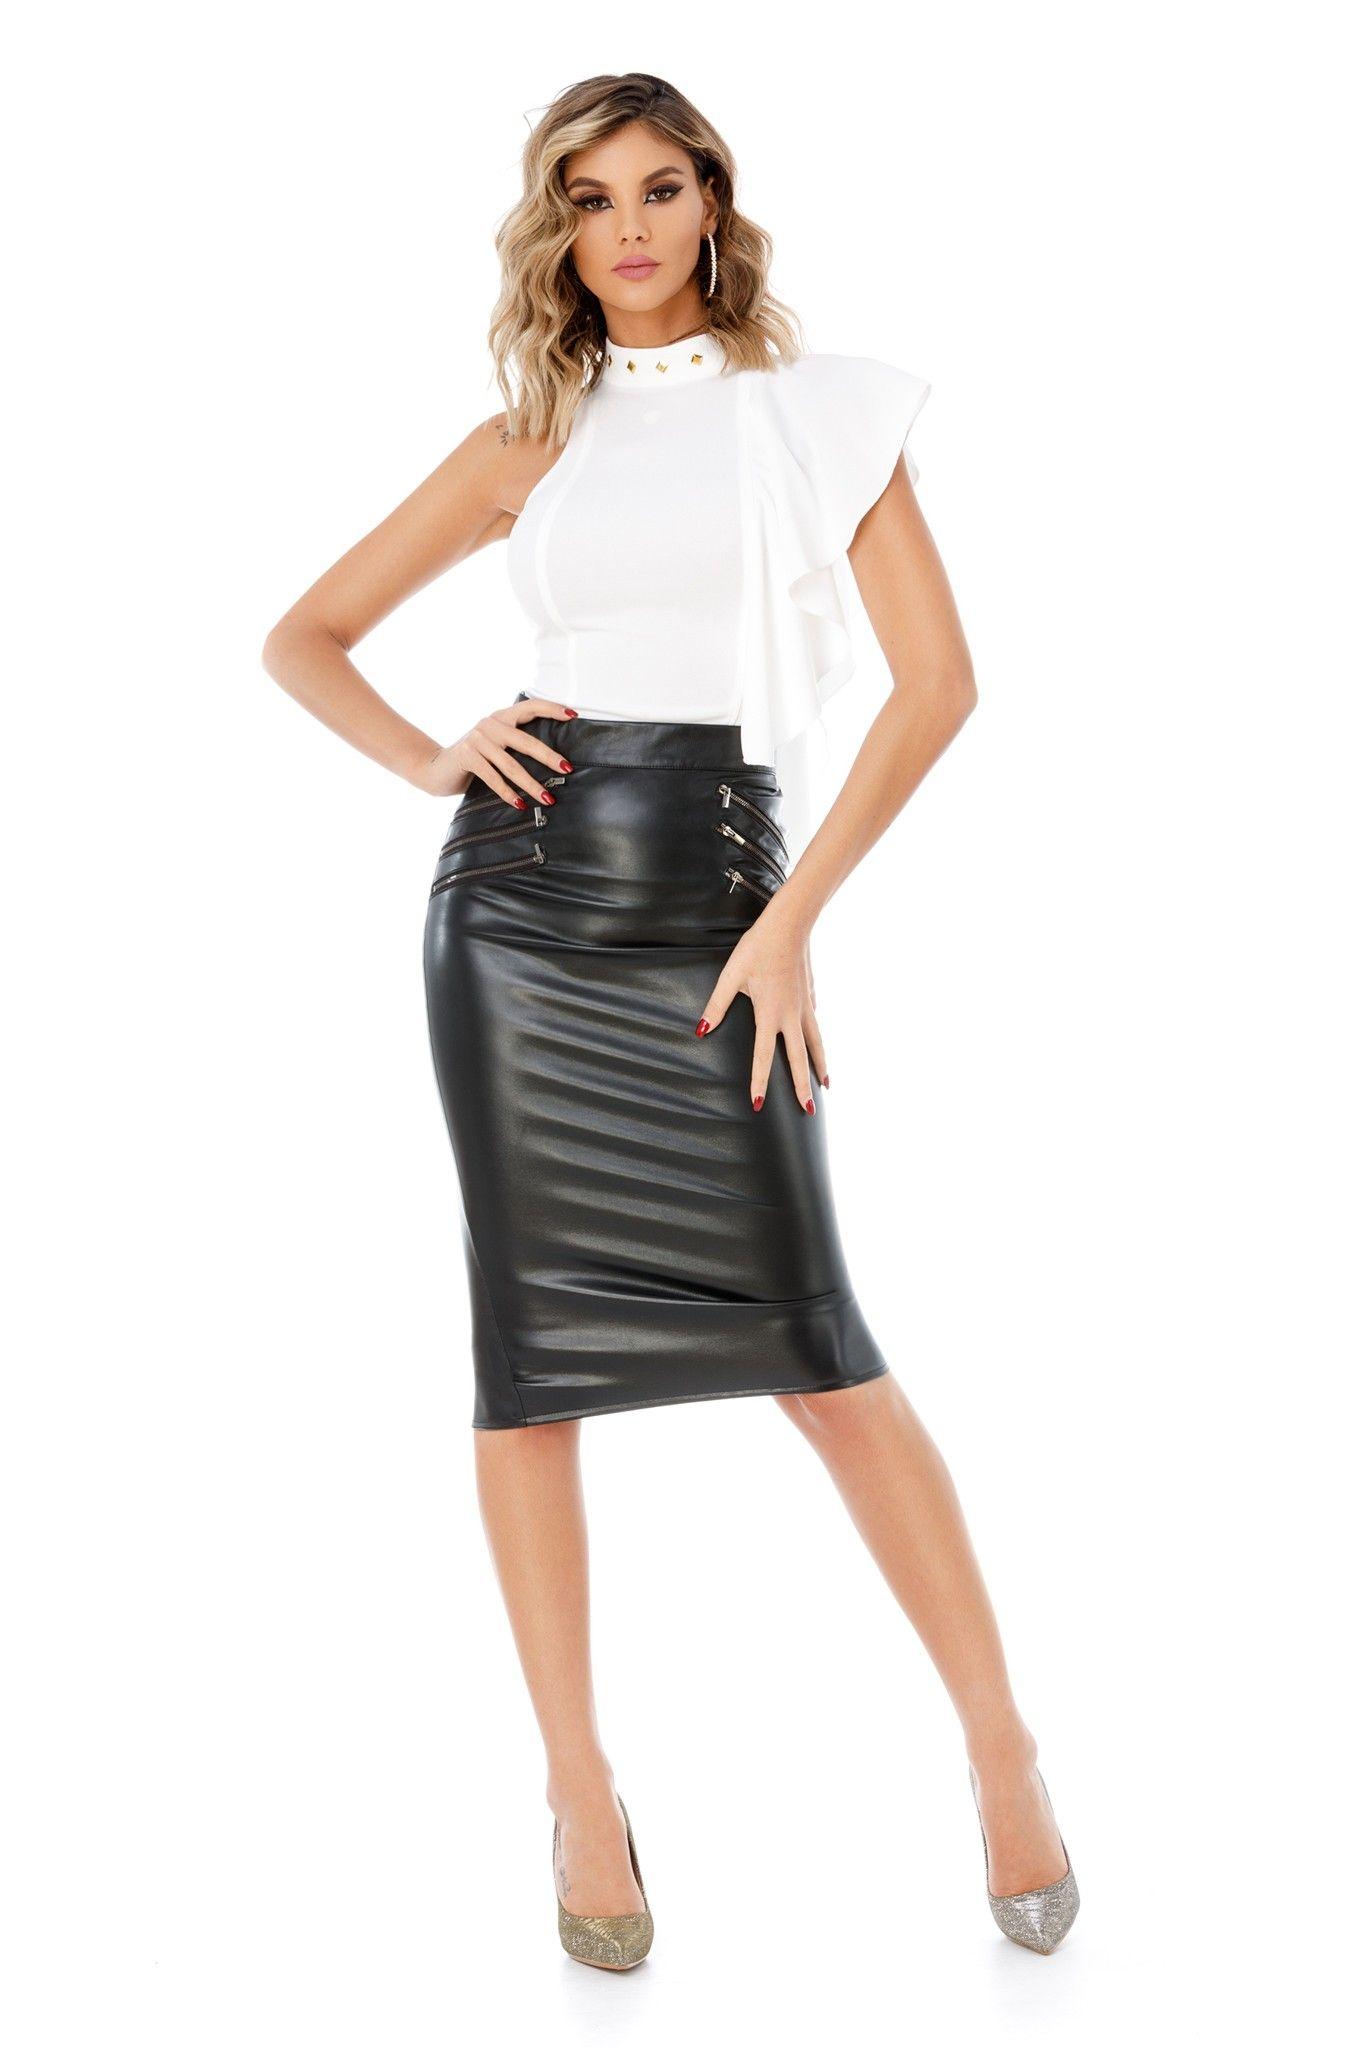 on sale e8653 2eeab Longuette di colore nero in ecopelle | Shopping online in ...